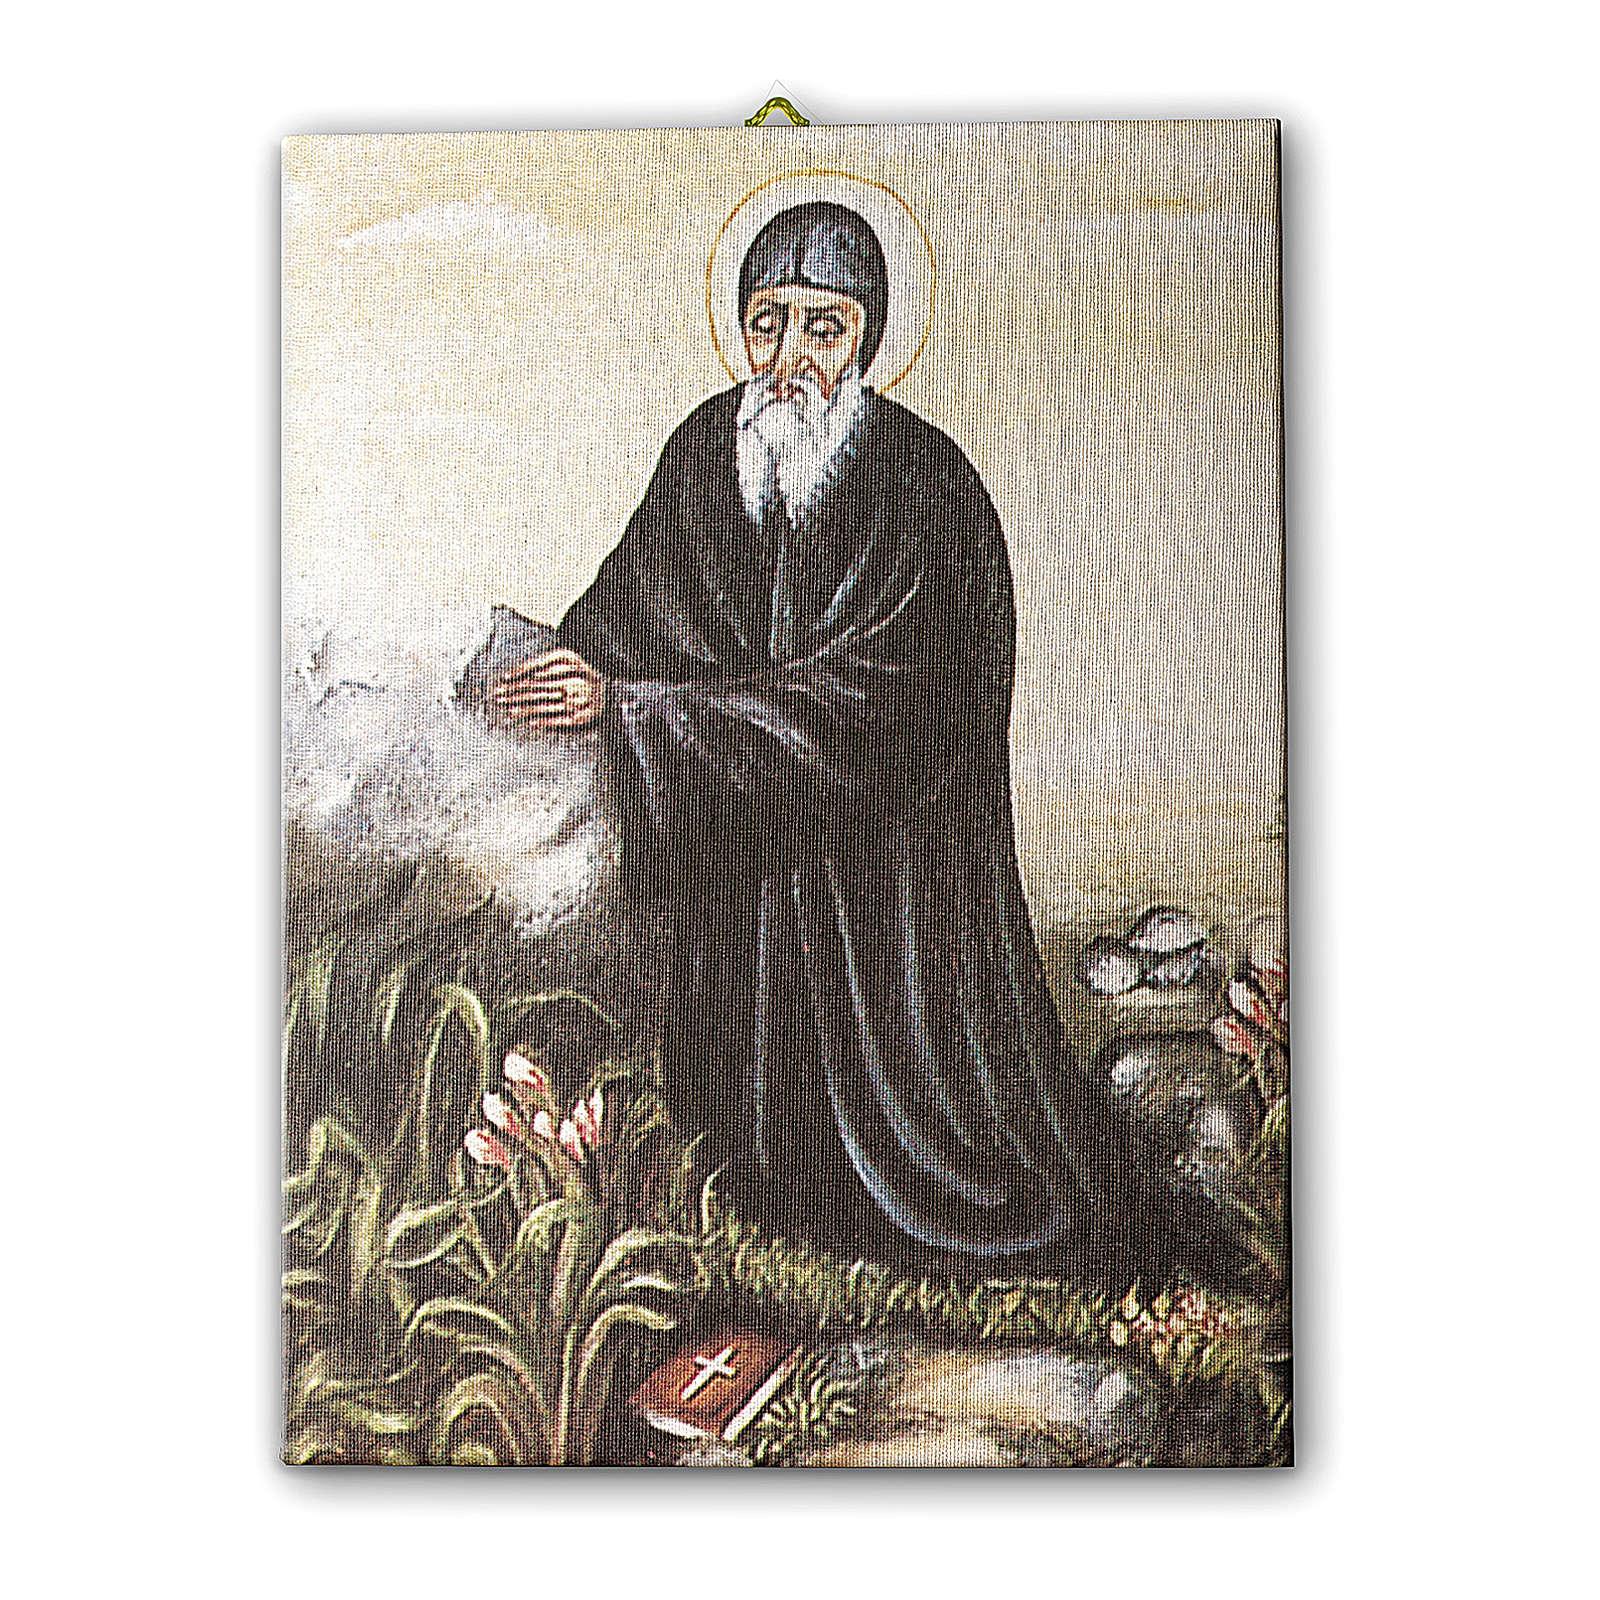 Quadro su tela pittorica San Charbel 70x50 cm 3